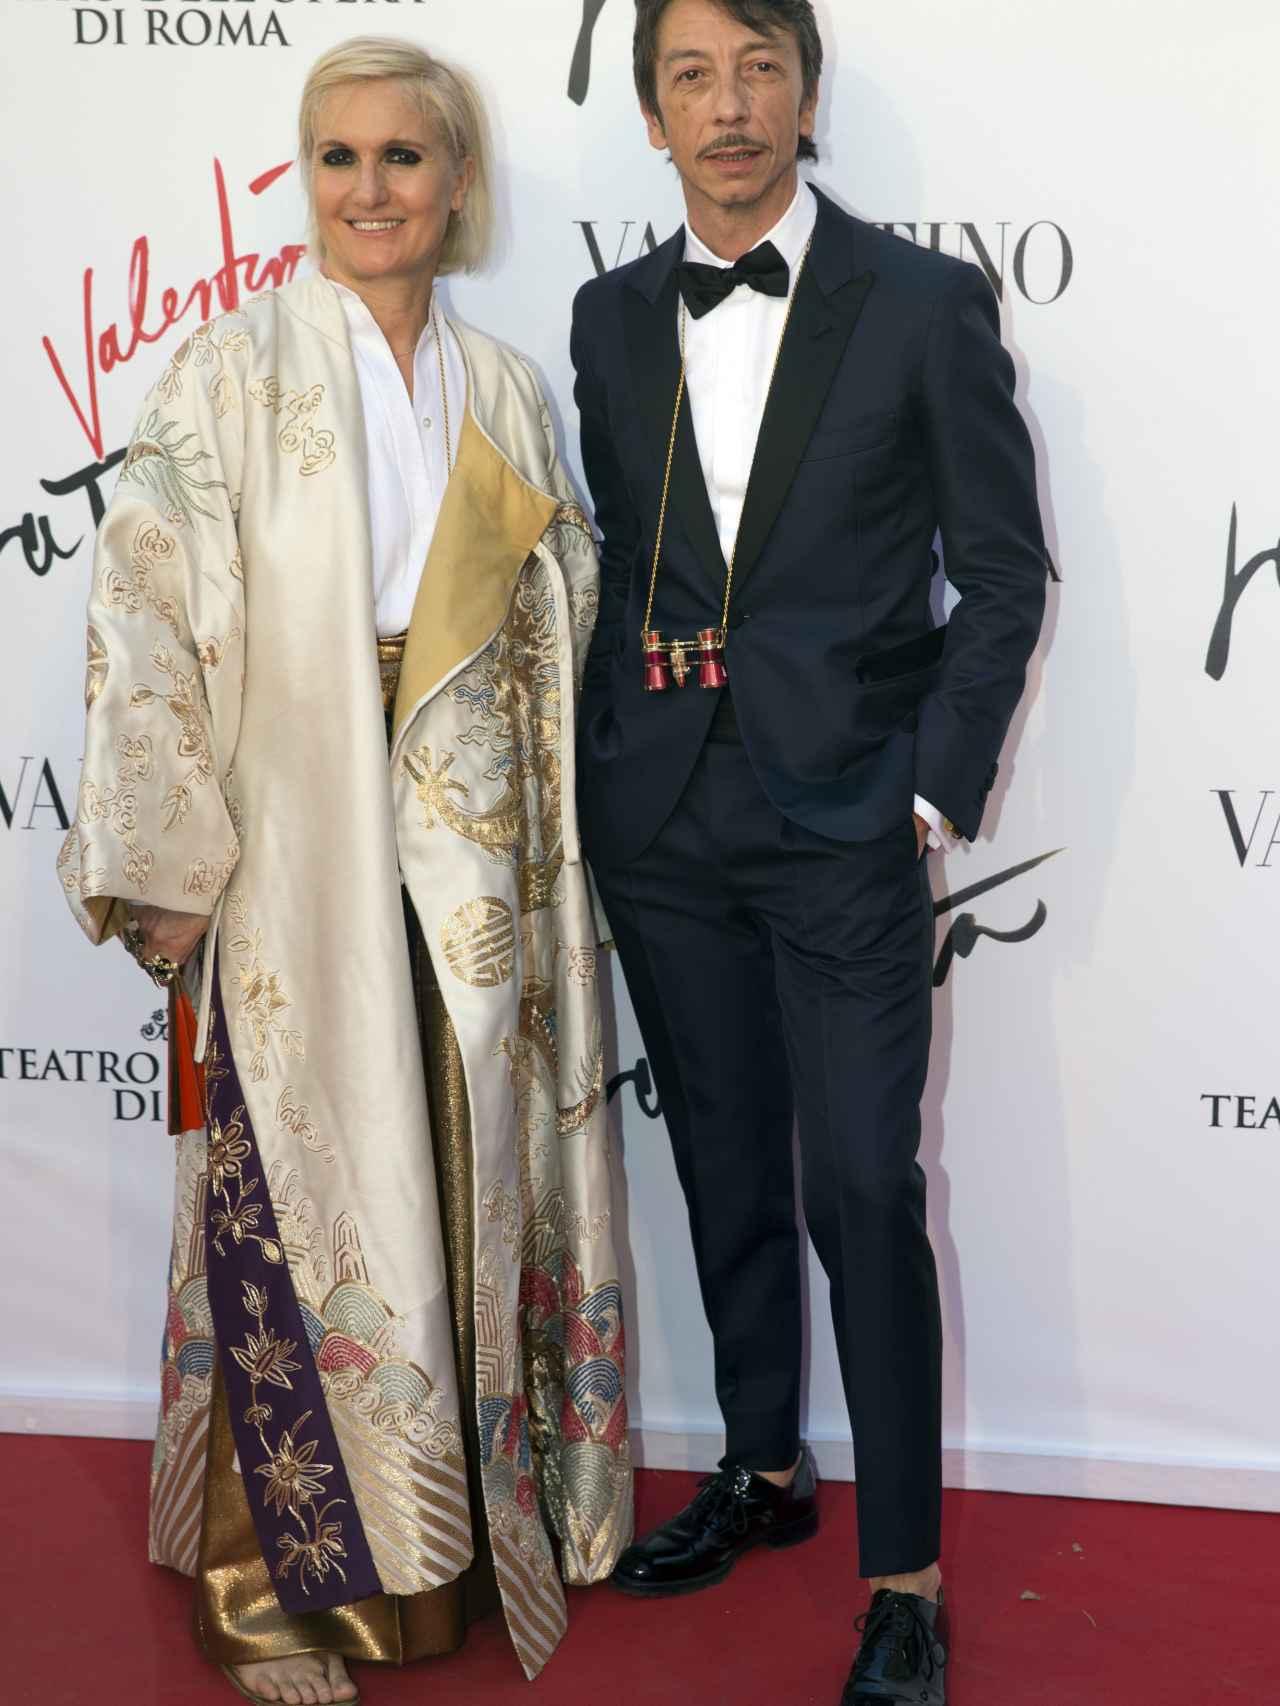 Maria Grazia y su ya ex-compañero Pierpaolo Piccioli.